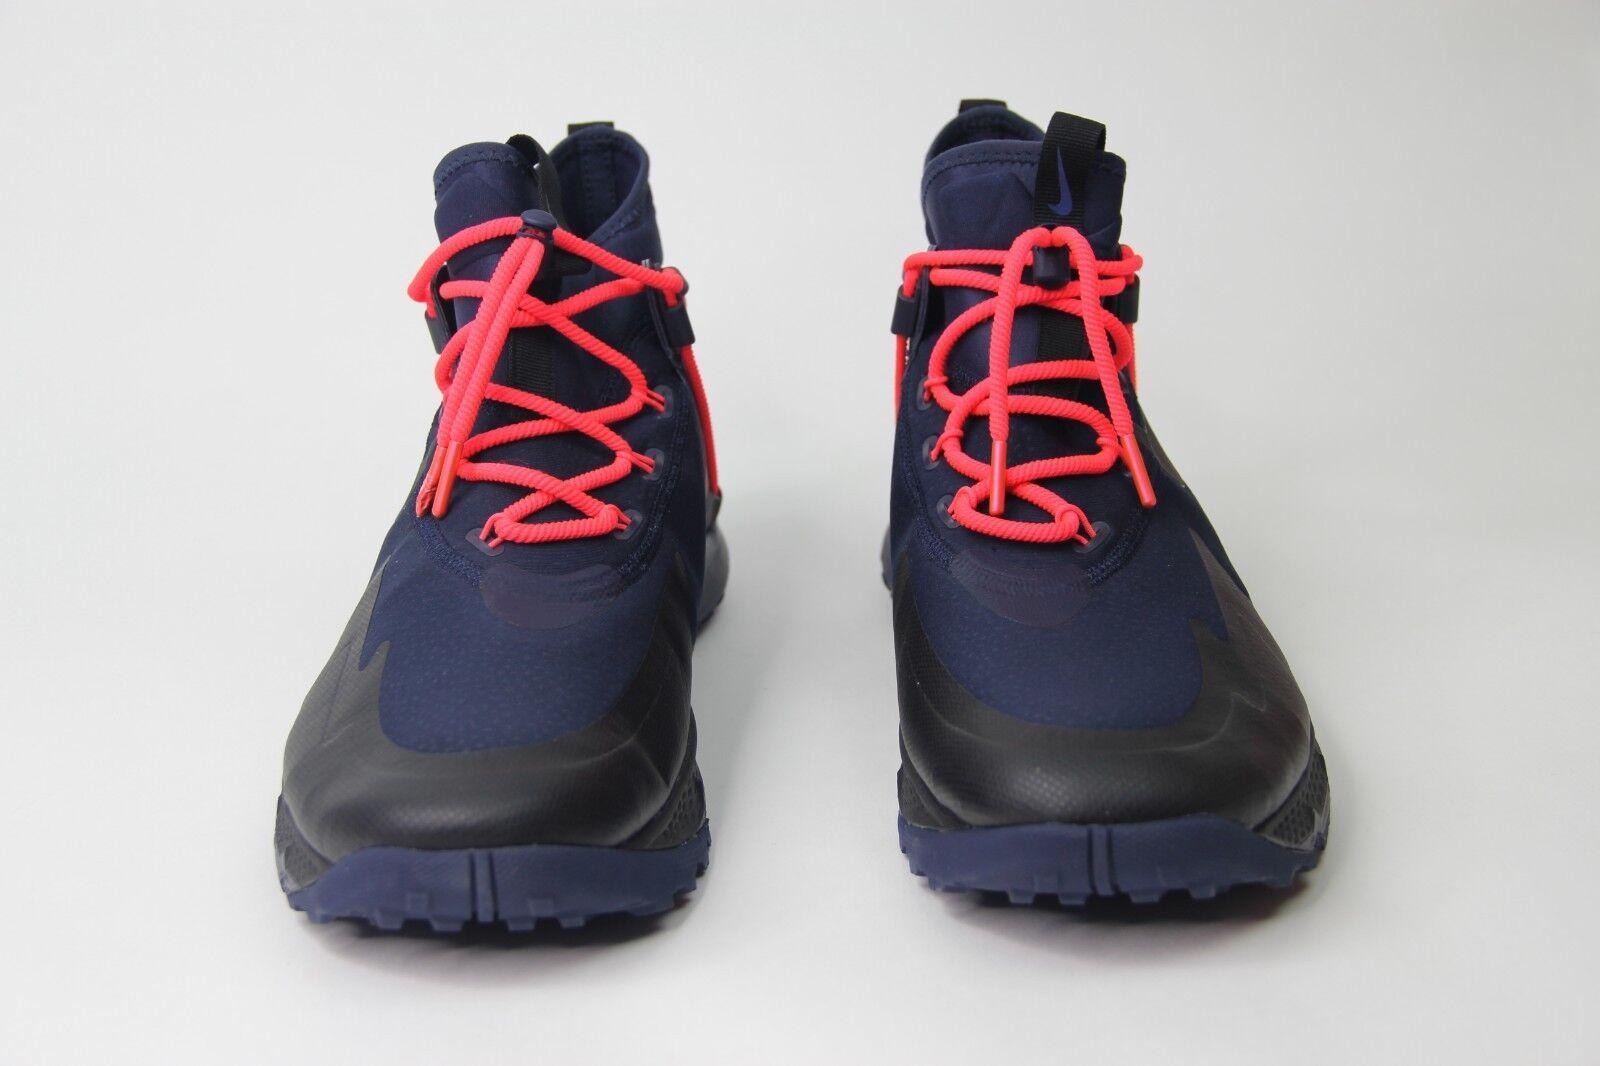 Nike Terra Sertig Boots Obsidian Red Black Hiking shoes916830-400 Mens SZ  160